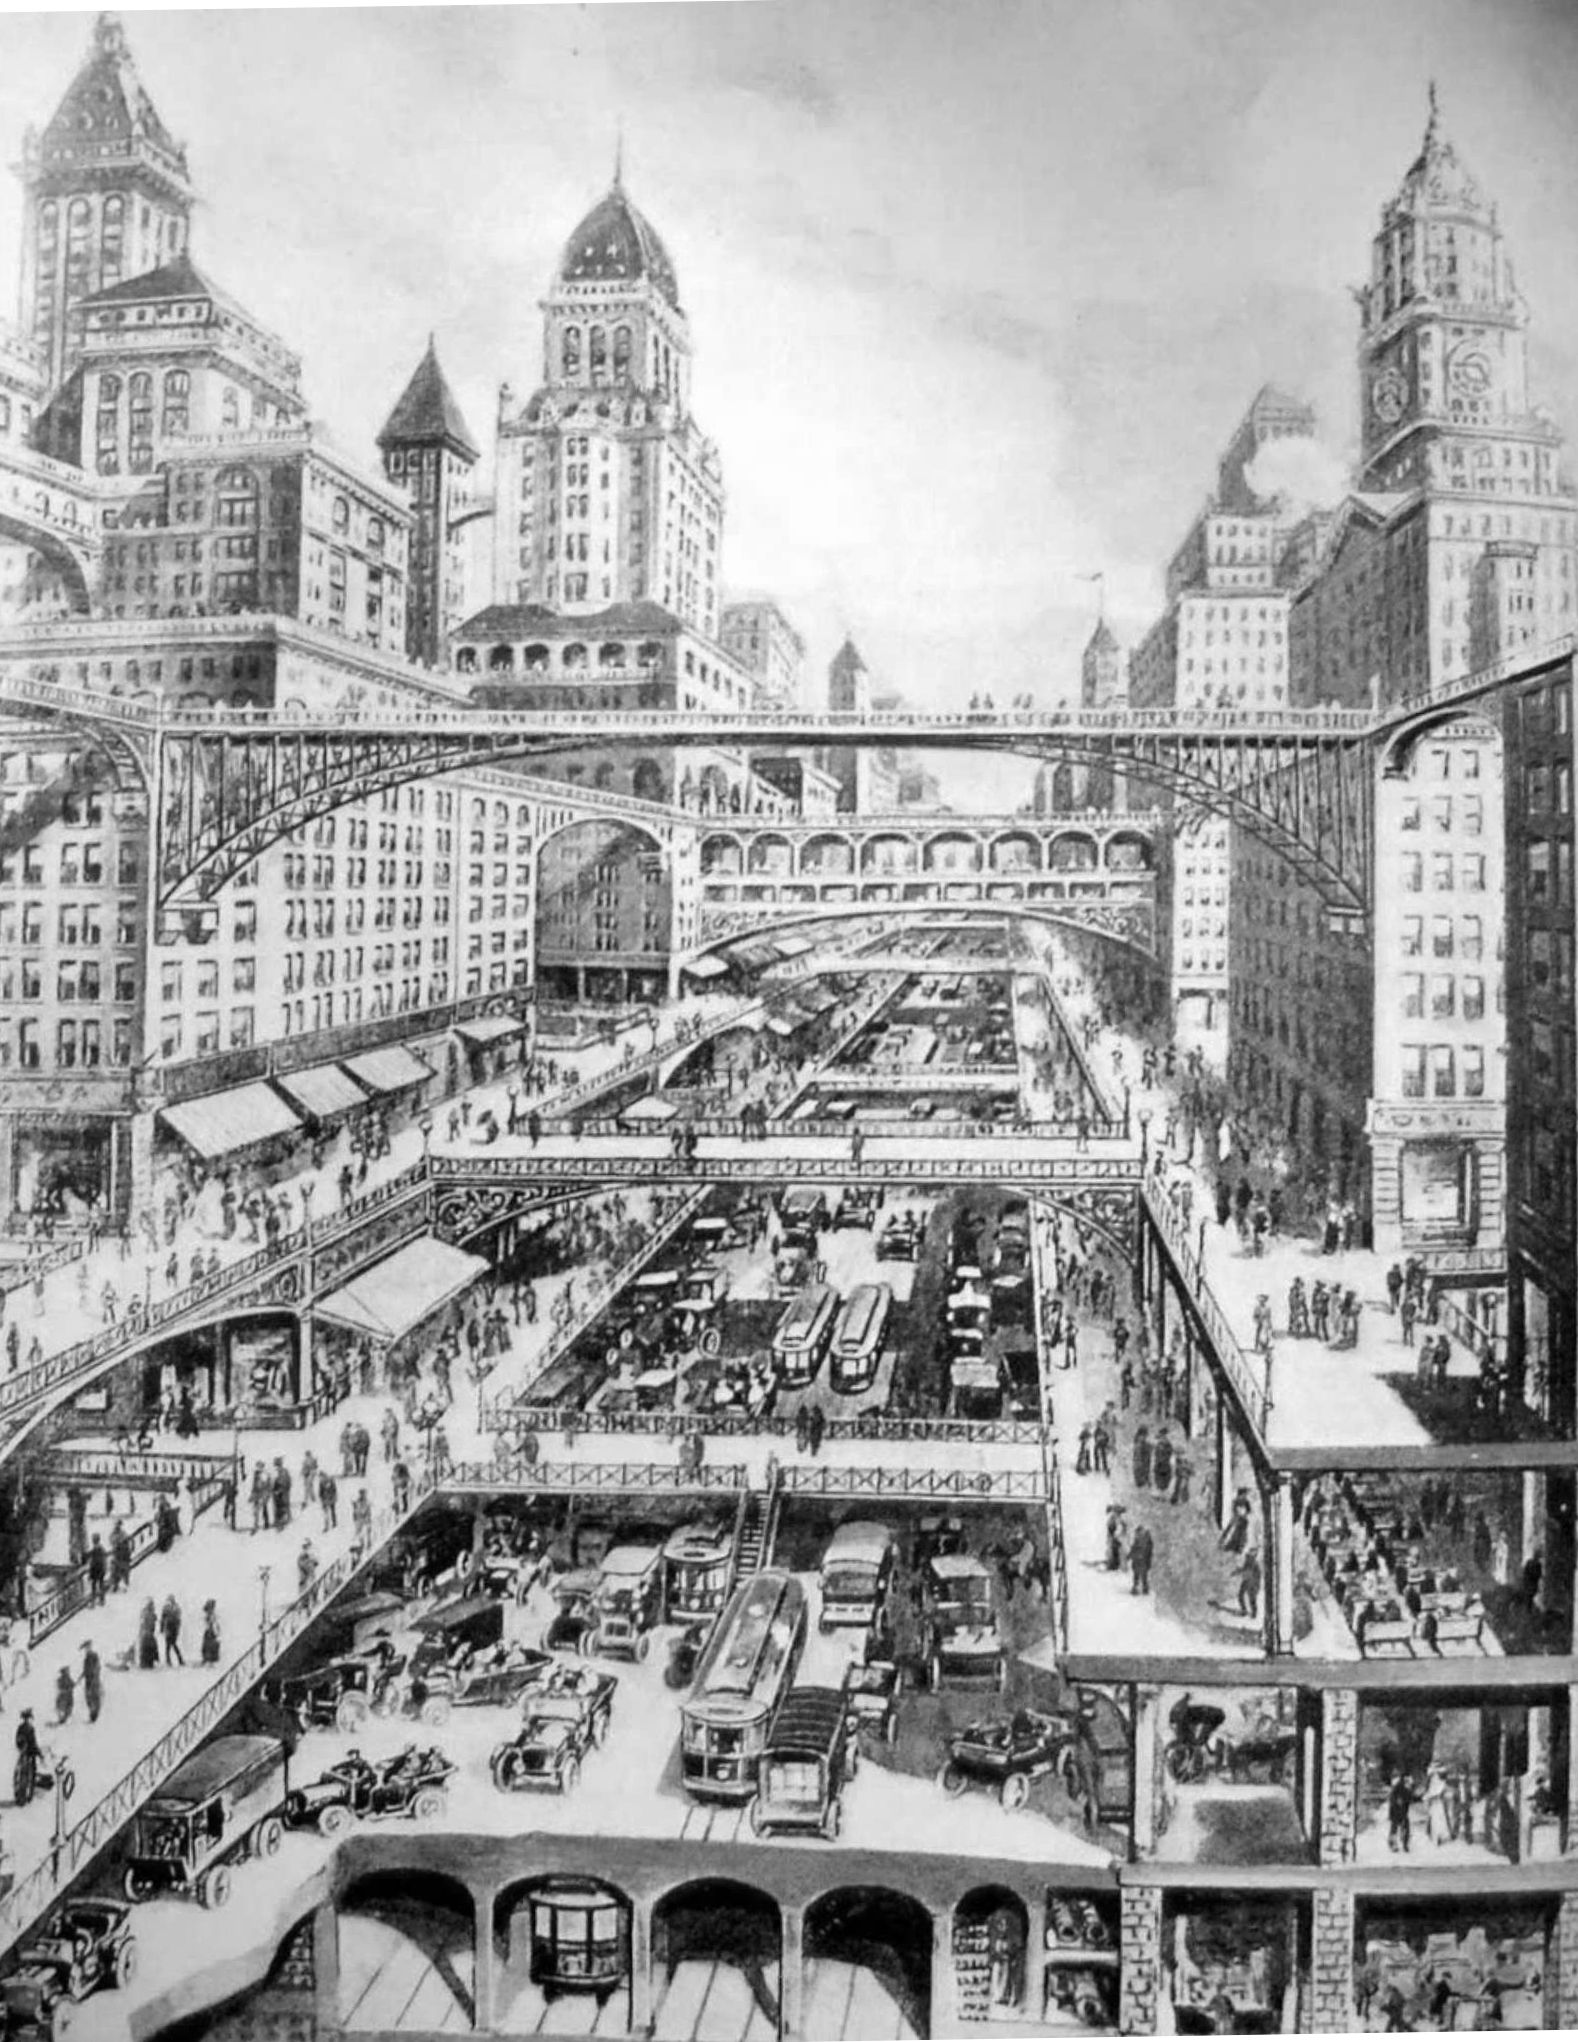 Harvey Wiley Corbett's 'City of the Future' in 1913